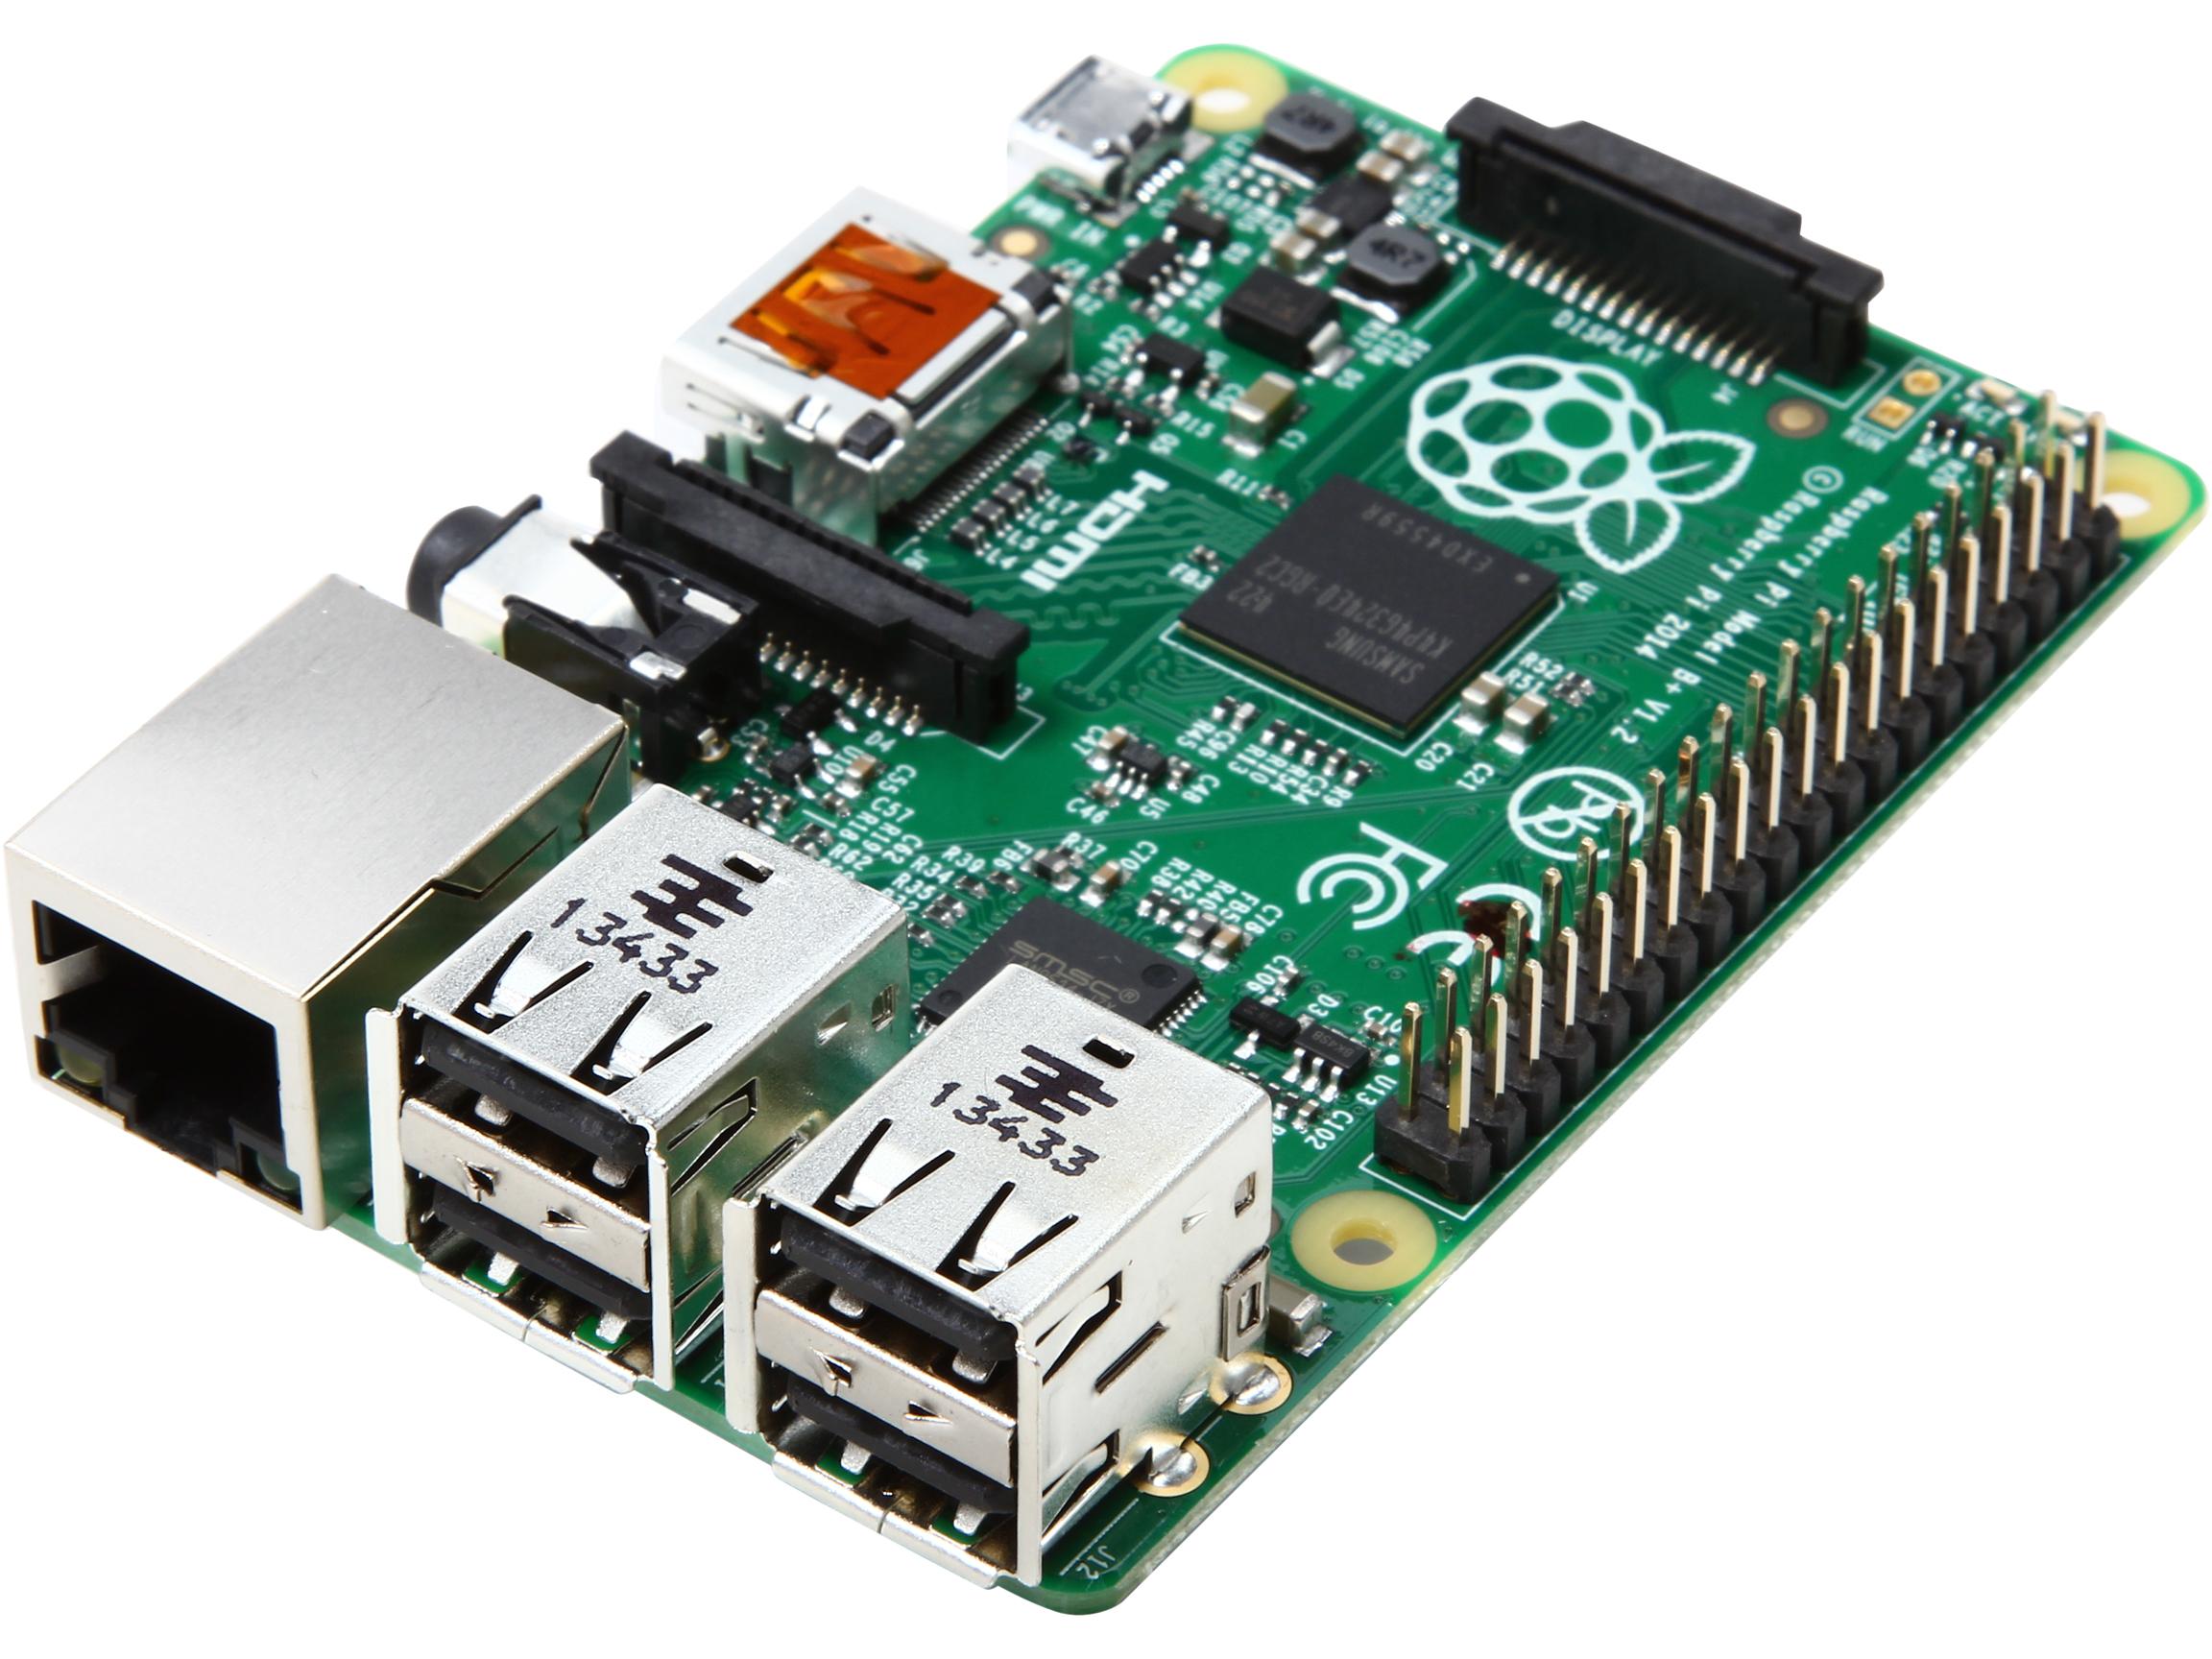 Raspberry Pi B+ Broadcom BCM2835 SoC ARM11 700 MHz